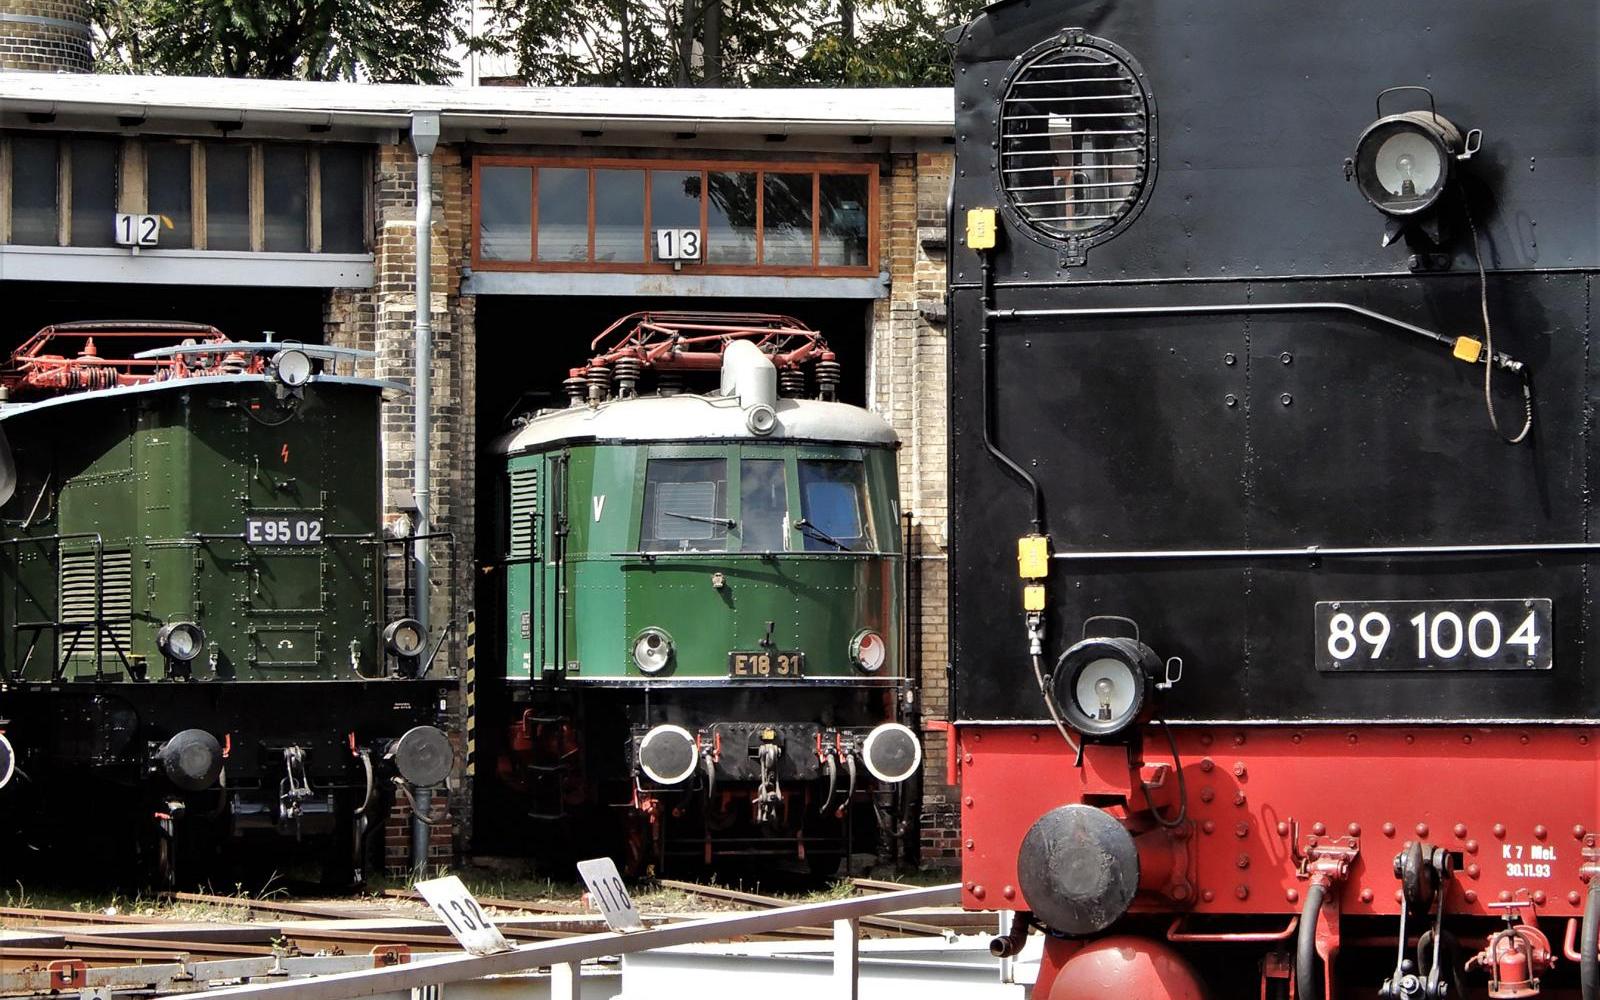 ©Foto: Christian Wodzinski | railmen | Blick in den Lokschuppen des DB Museums Halle